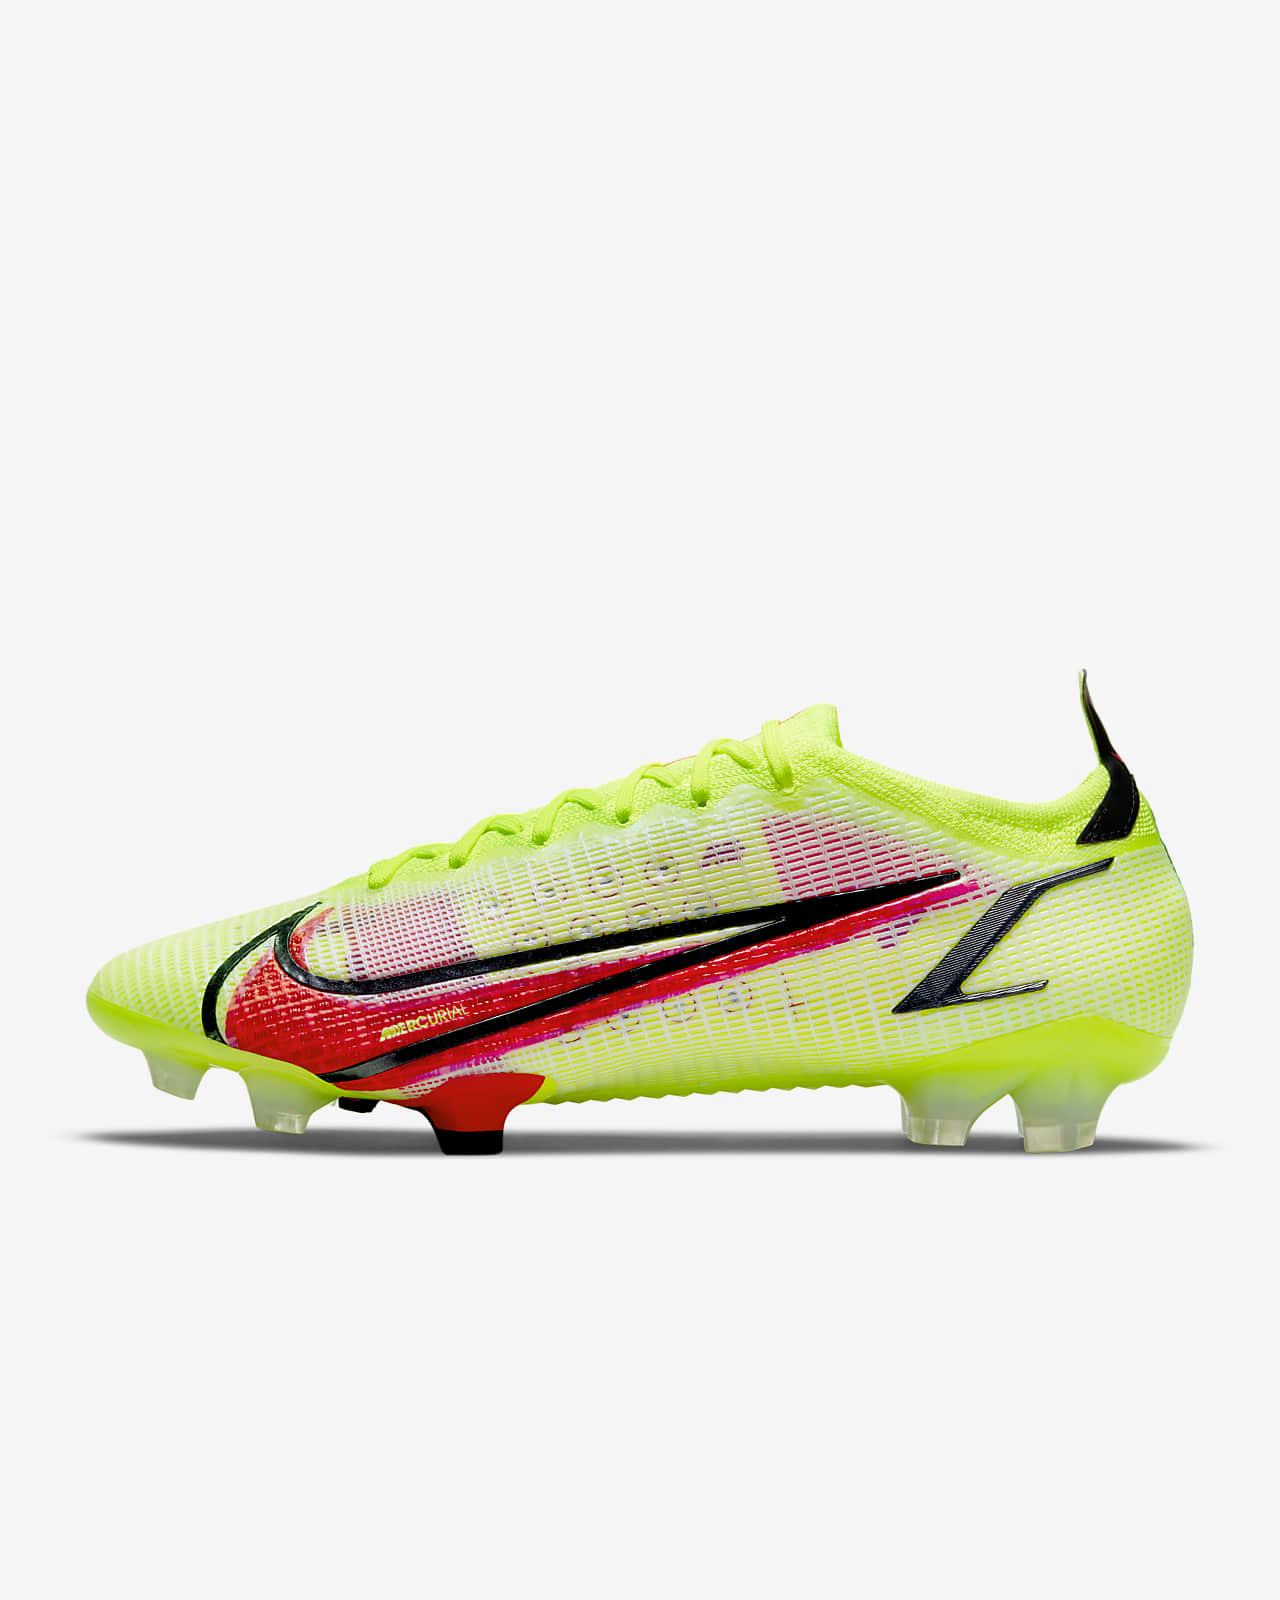 Scarpa da calcio per terreni duri Nike Mercurial Vapor 14 Elite FG